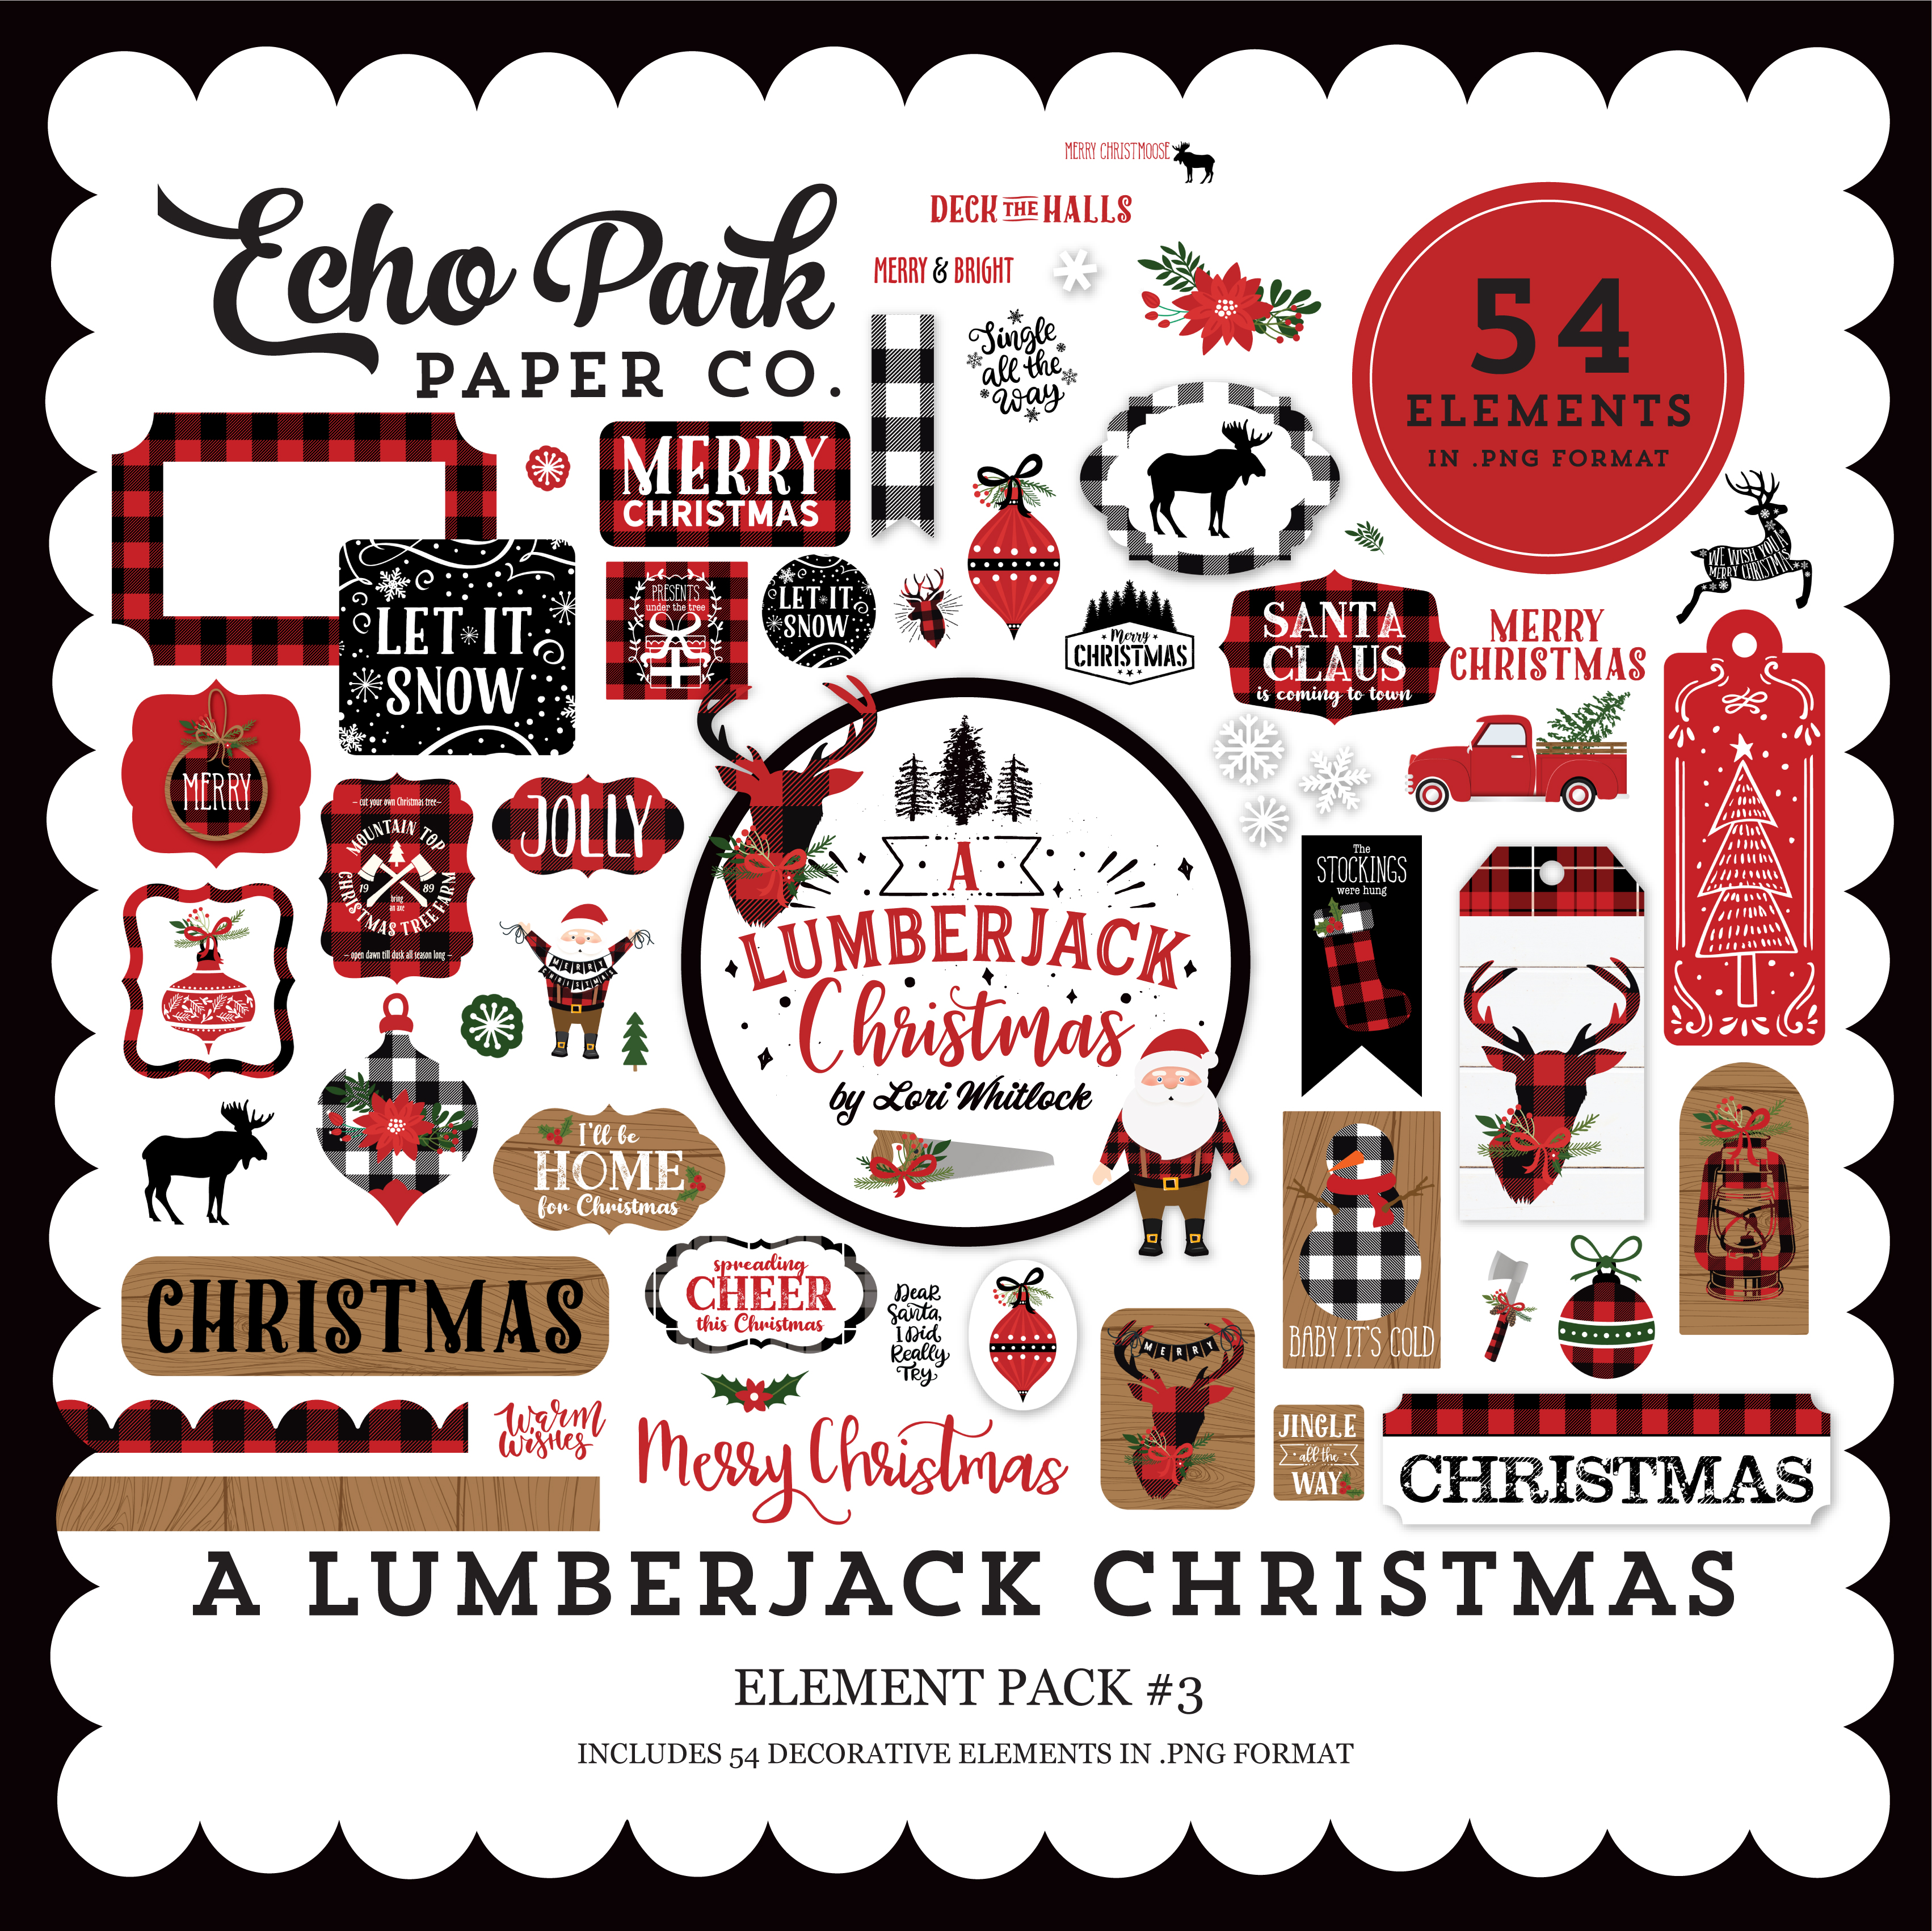 A Lumberjack Christmas Element Pack #3